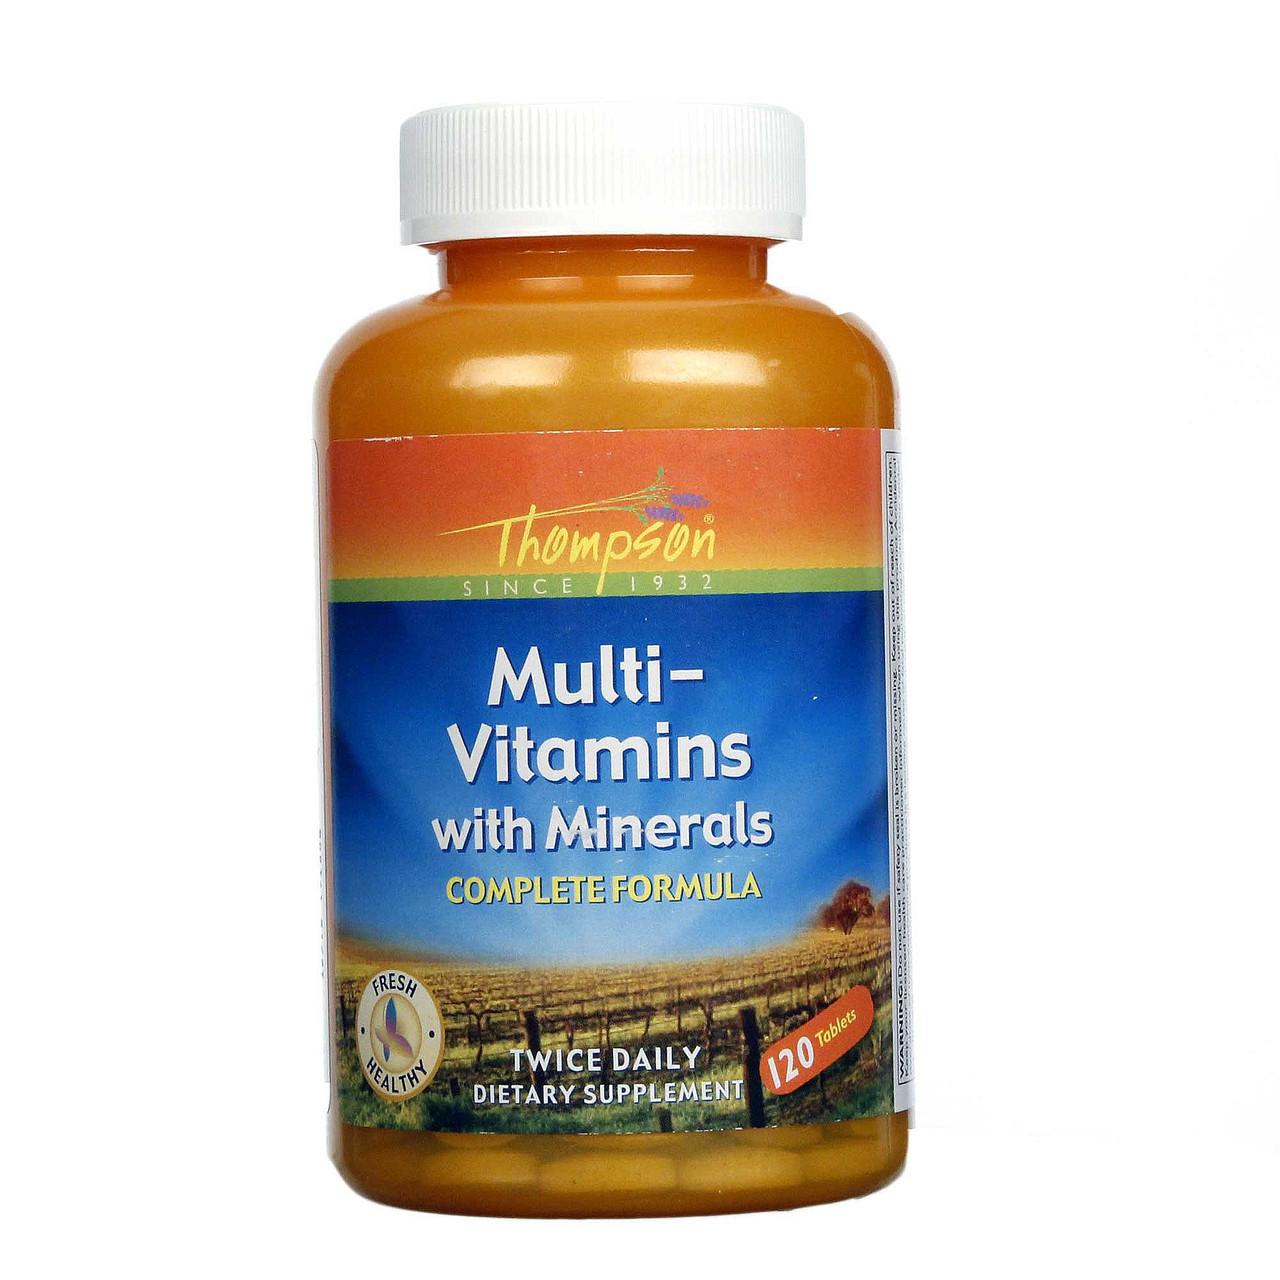 Витамины Thompson Multi-Vitamin with Minerals 120 таблеток - интернет-магазин besuto.prom.ua в Луцке